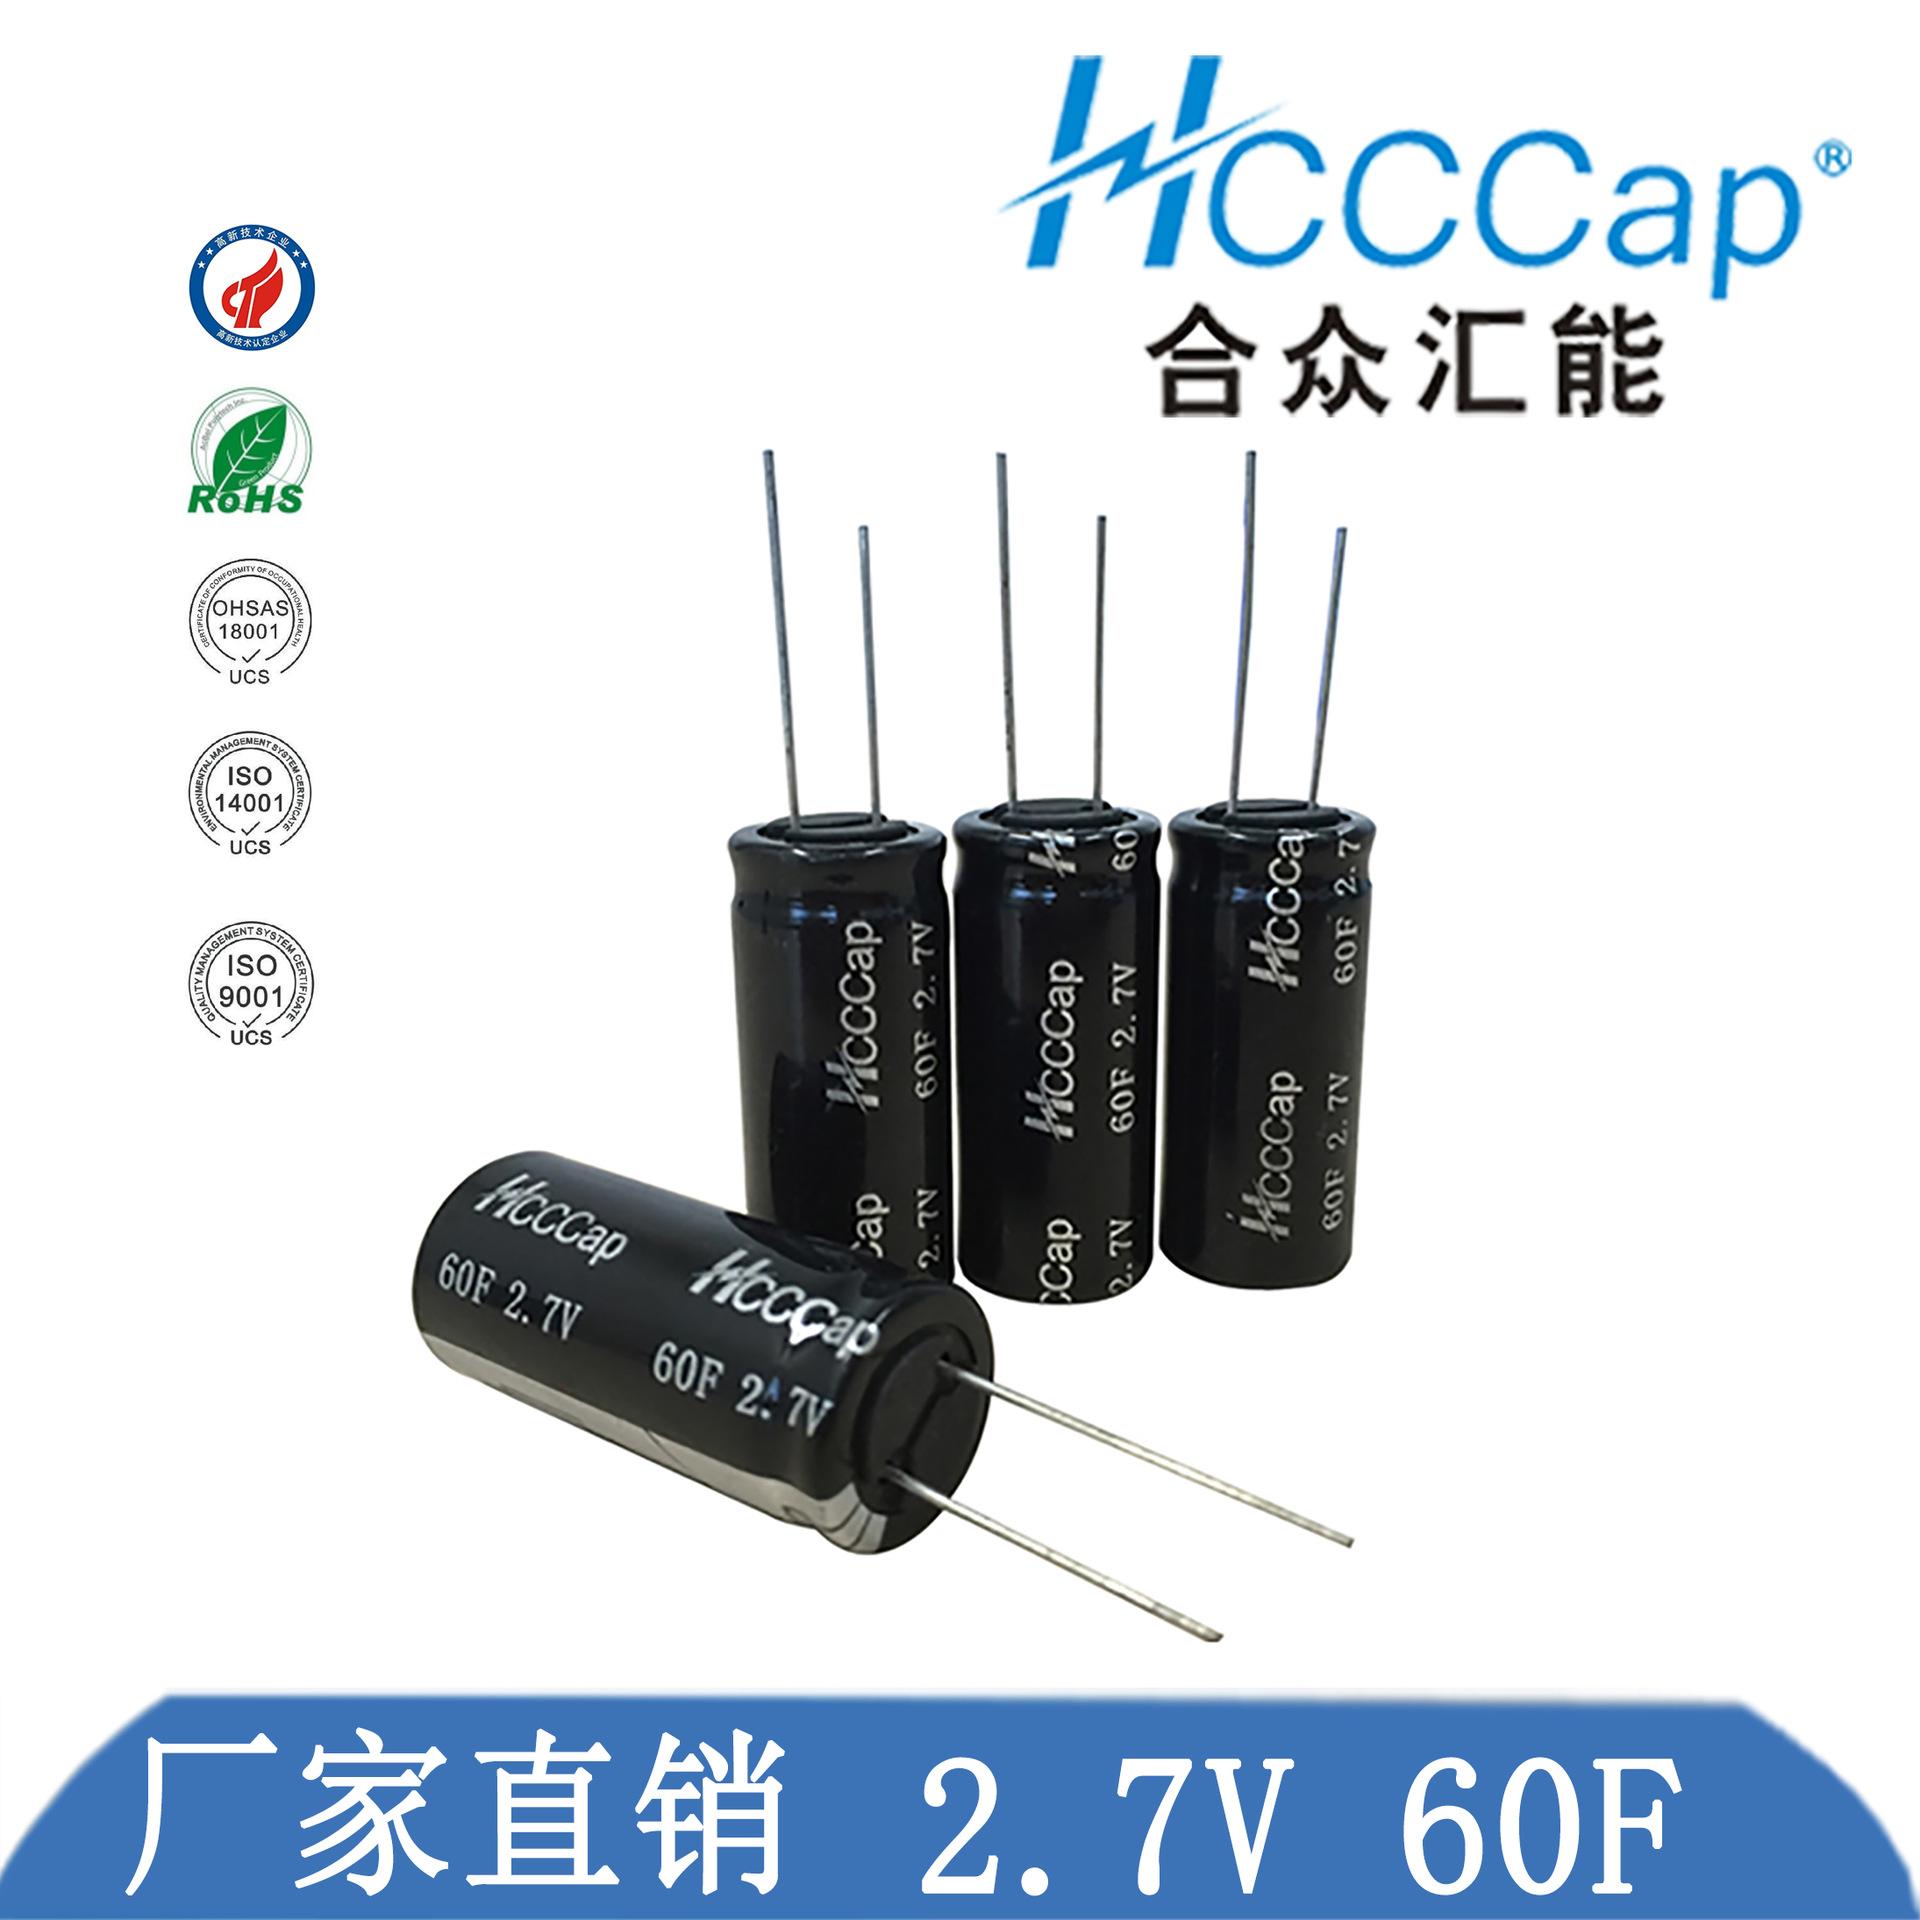 HCCCap合众汇能超级电容2.7V-60F厂家直销,详询15611260092